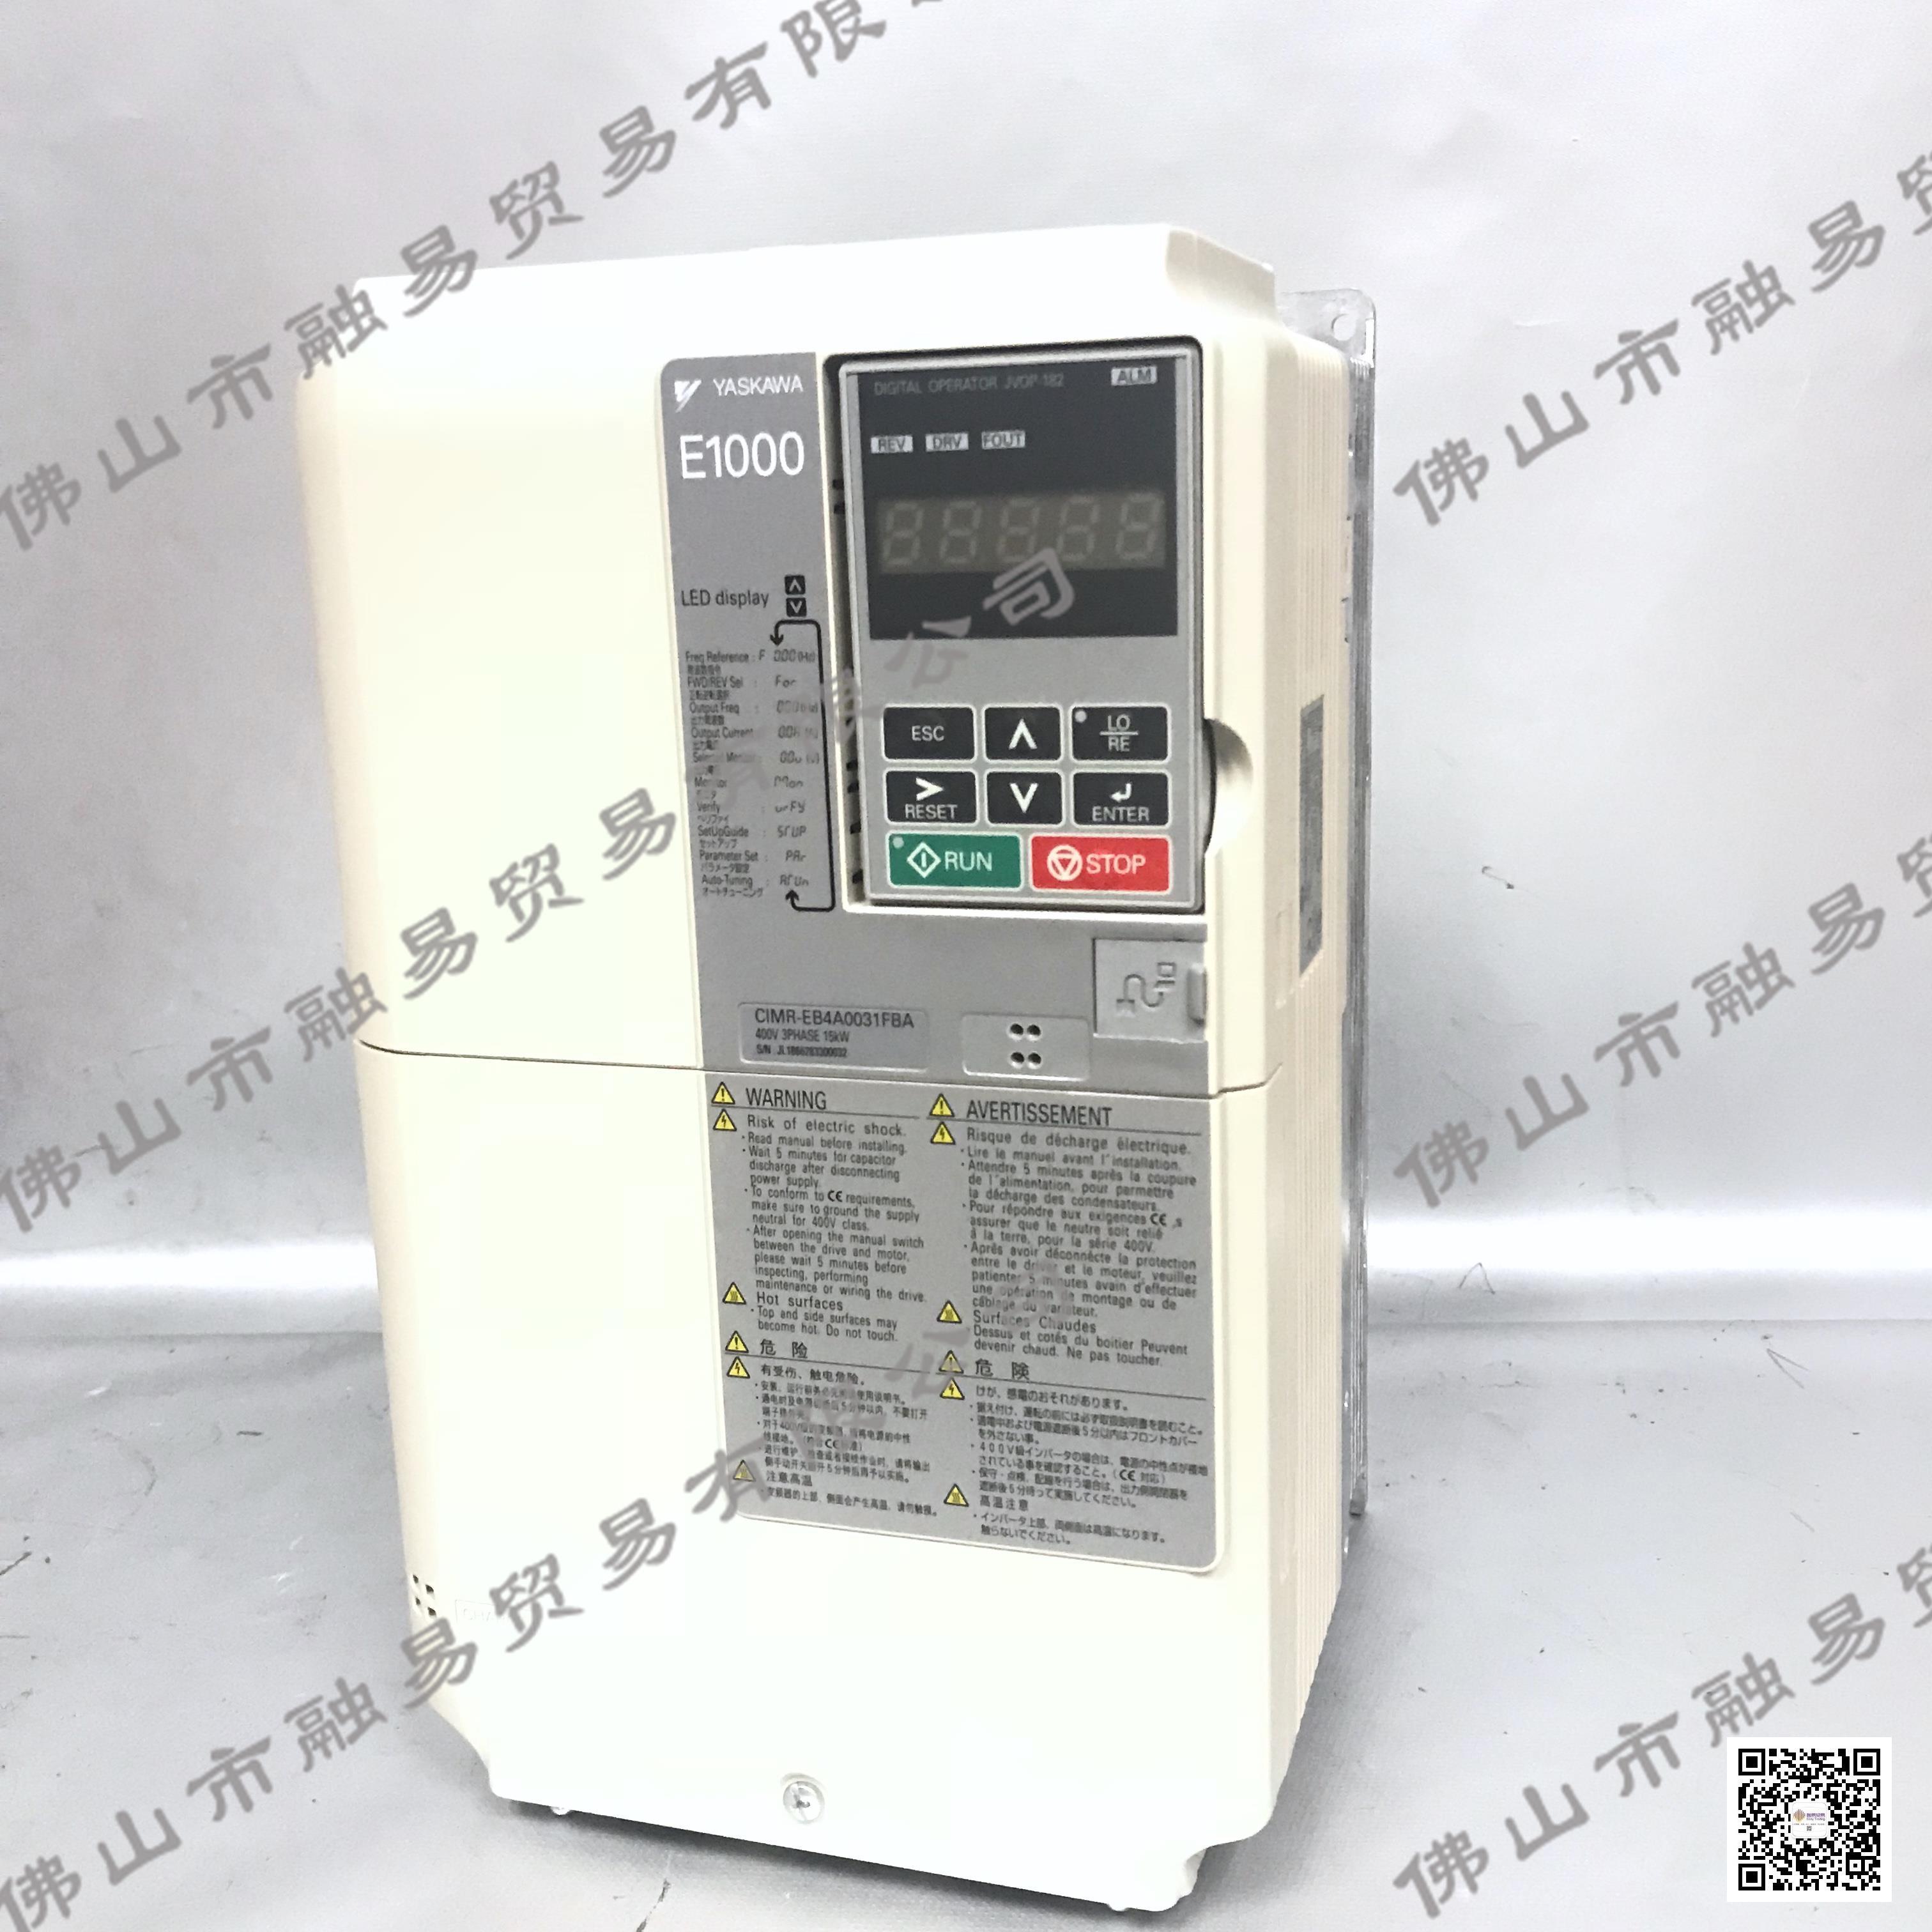 安川風機專用變頻器  E1000系列 15kw CIMR-EB4A0031FBA